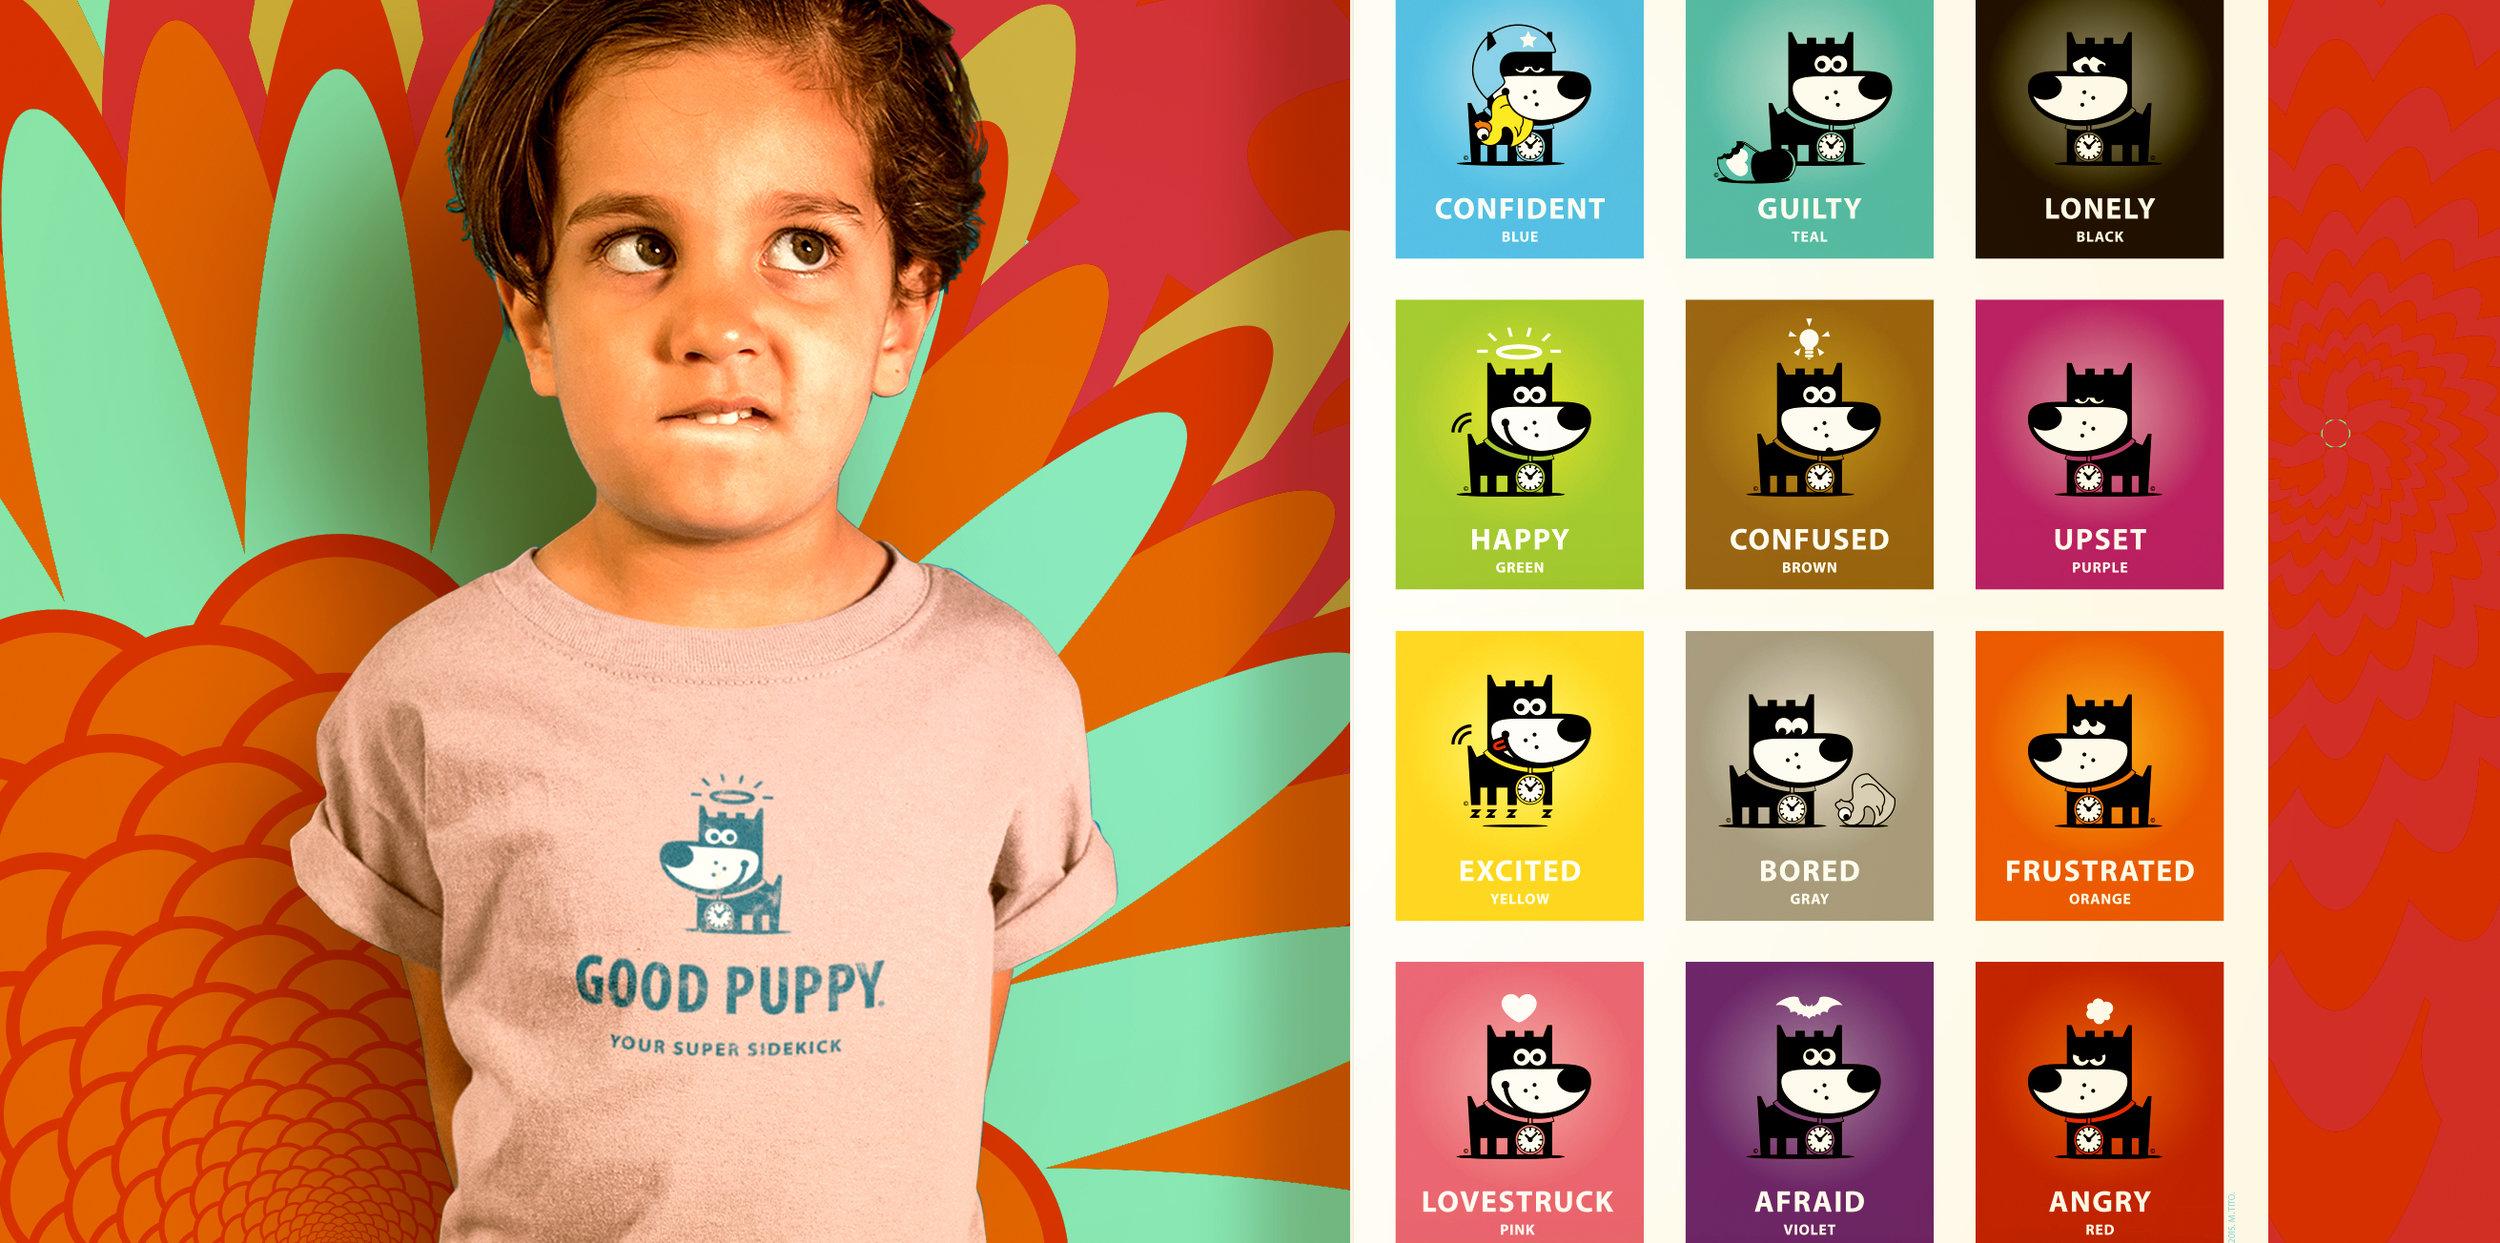 GoodPuppy-CBES-Collection_Heading-28-Emotions.jpg